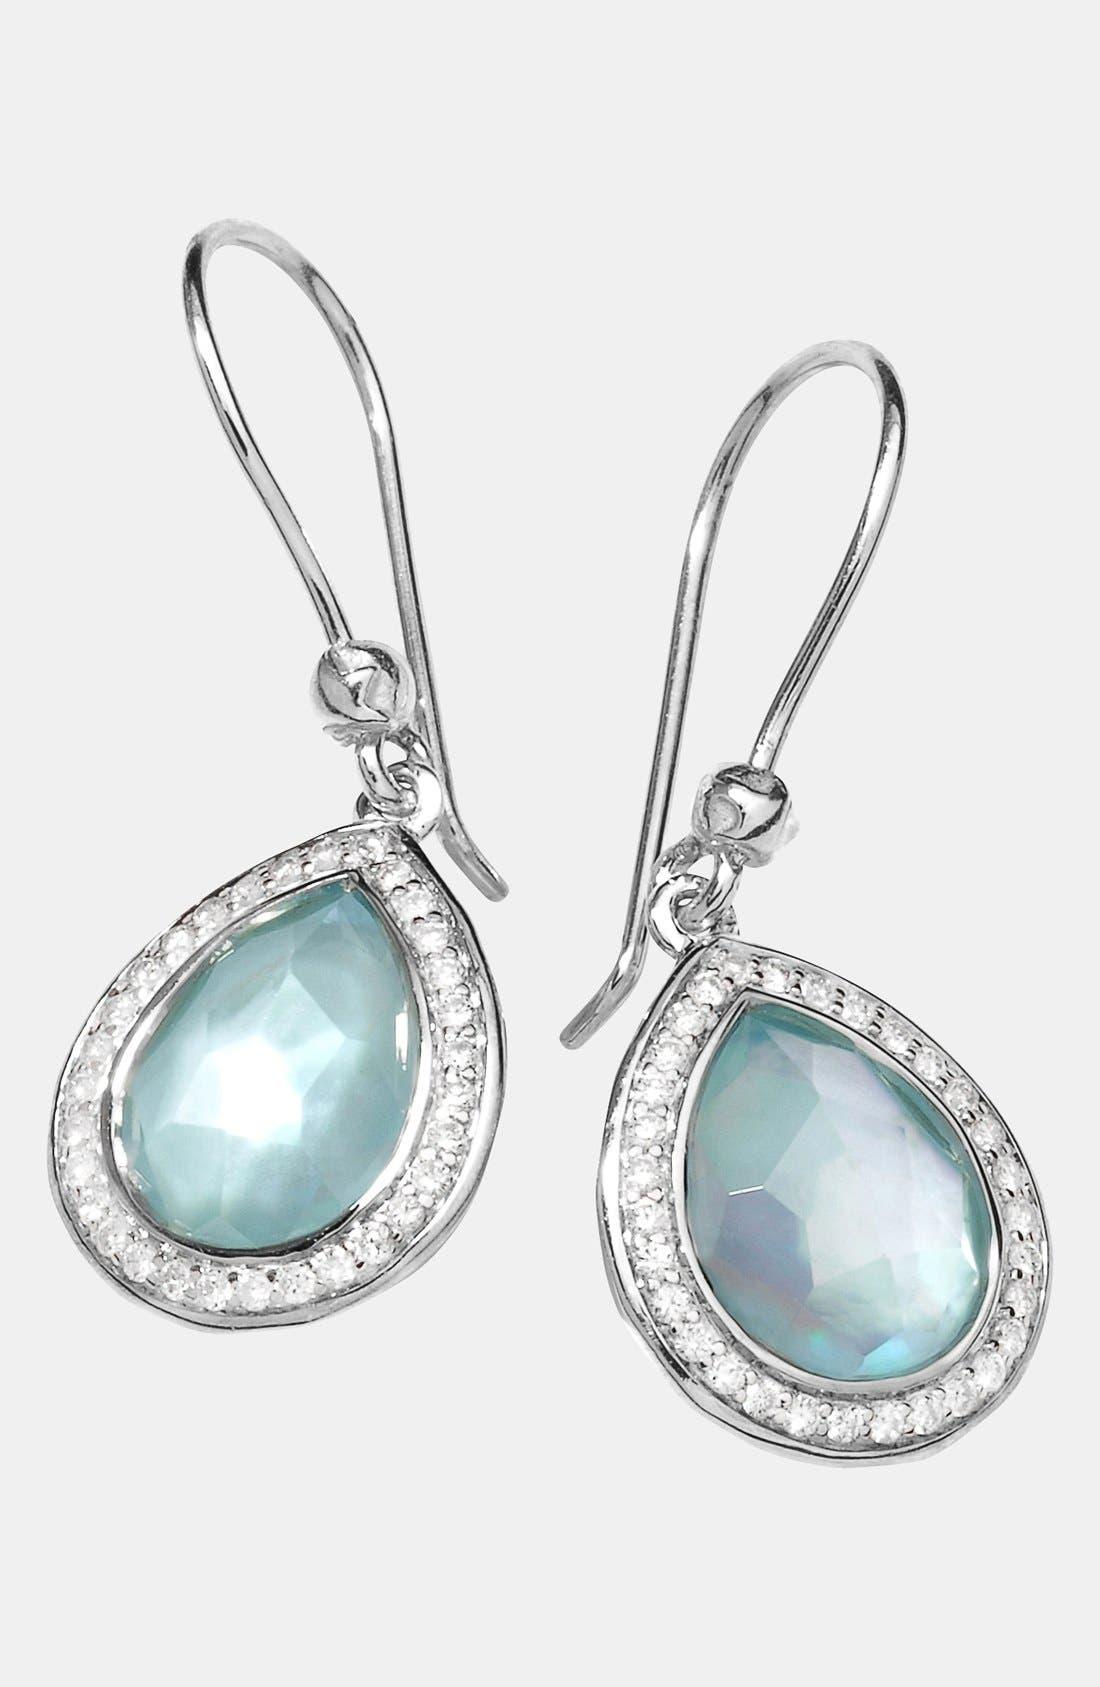 'Stella' Small Teardrop Earrings,                             Main thumbnail 1, color,                             Silver/ Blue Topaz